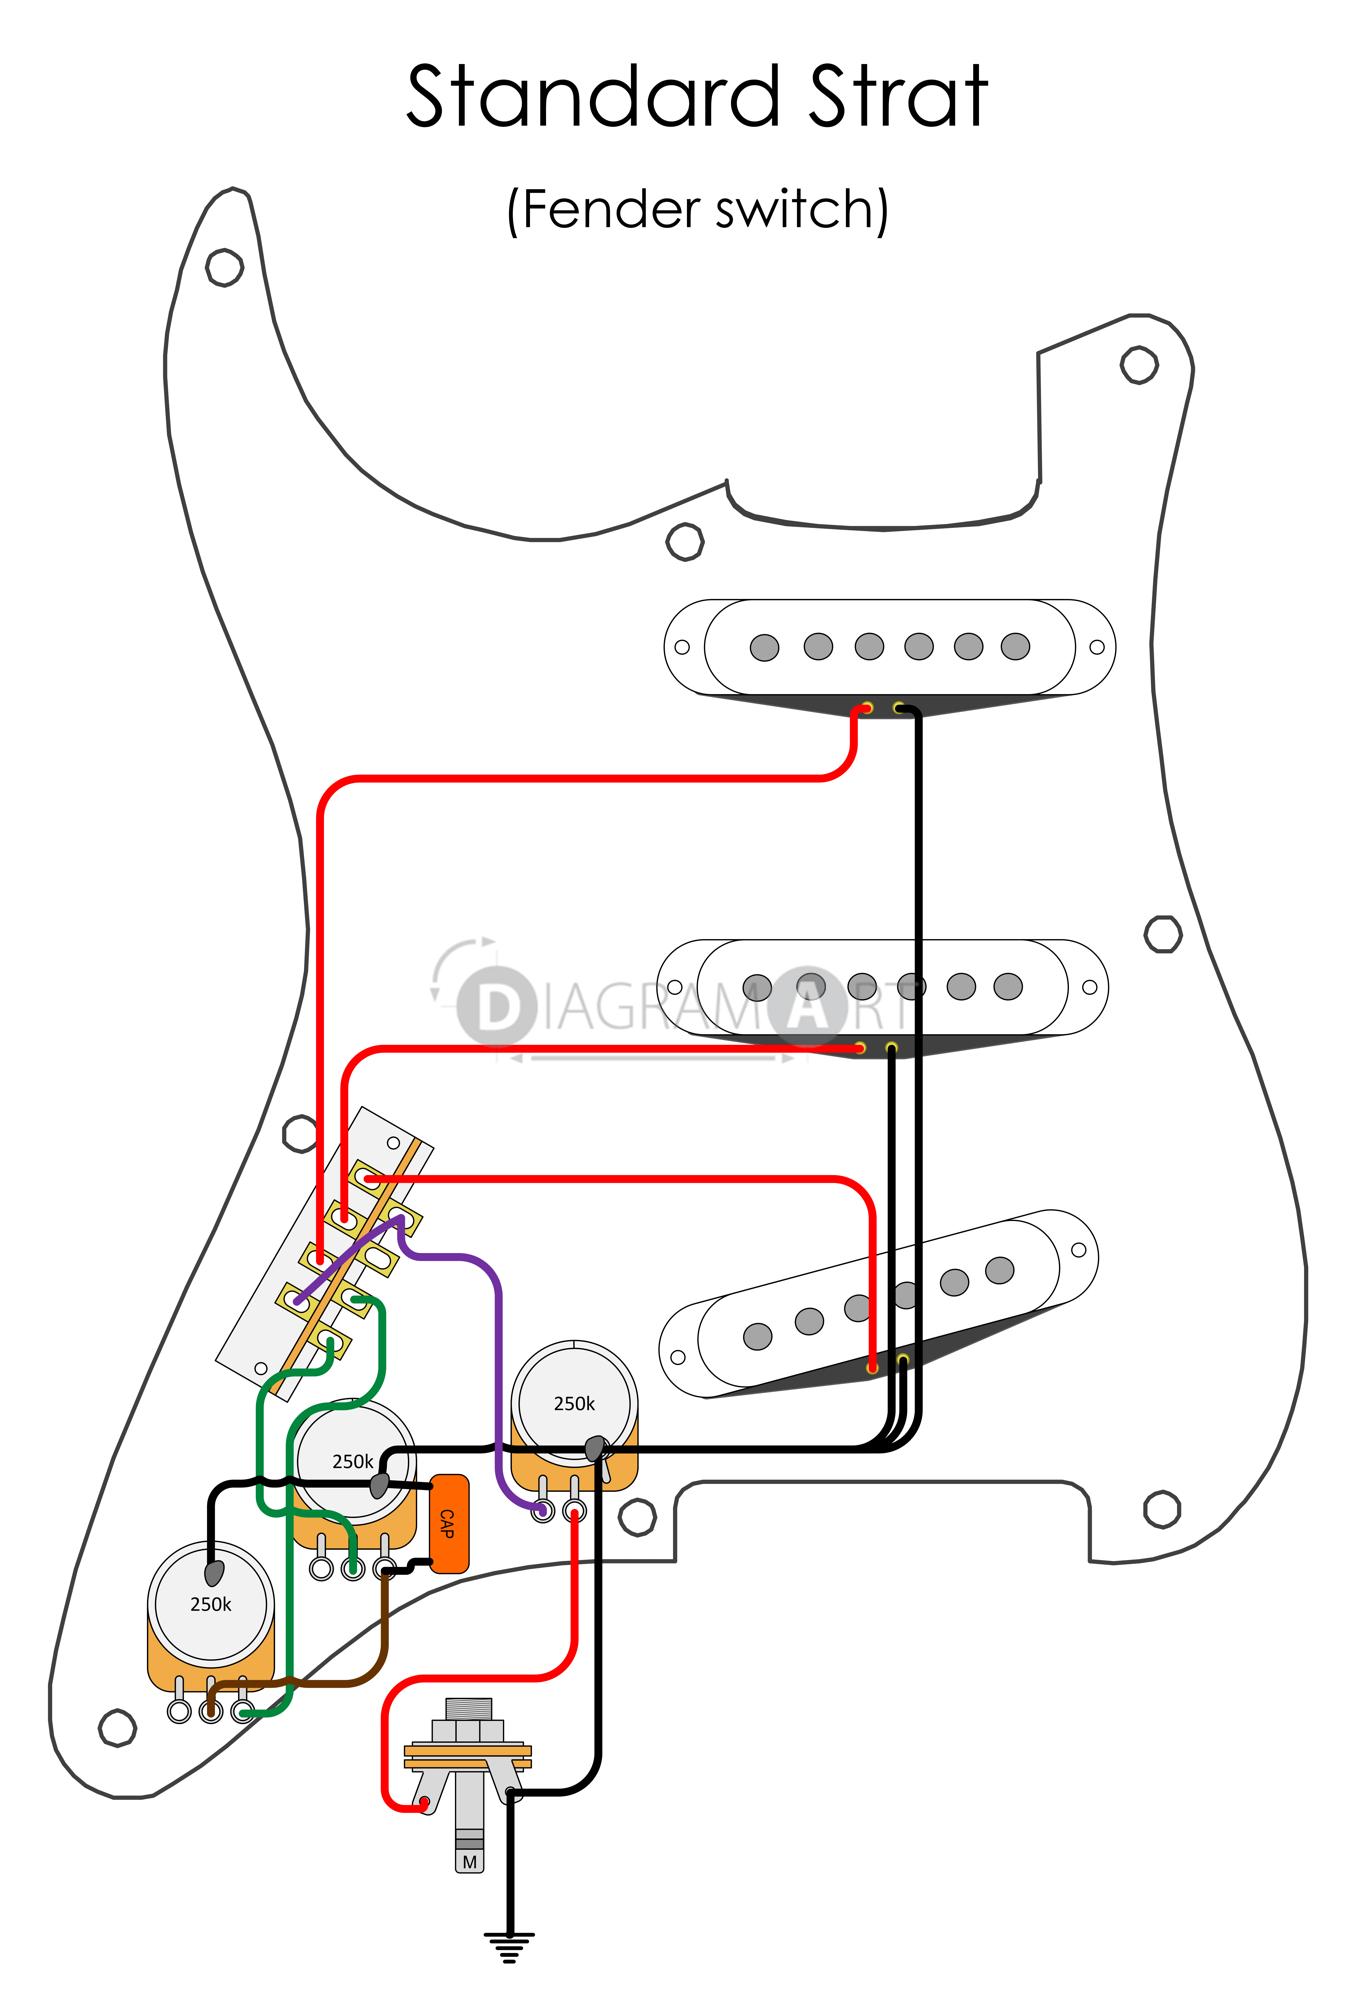 Stupendous Electric Guitar Wiring Standard Strat Fender Switch Electric Wiring Cloud Biosomenaidewilluminateatxorg